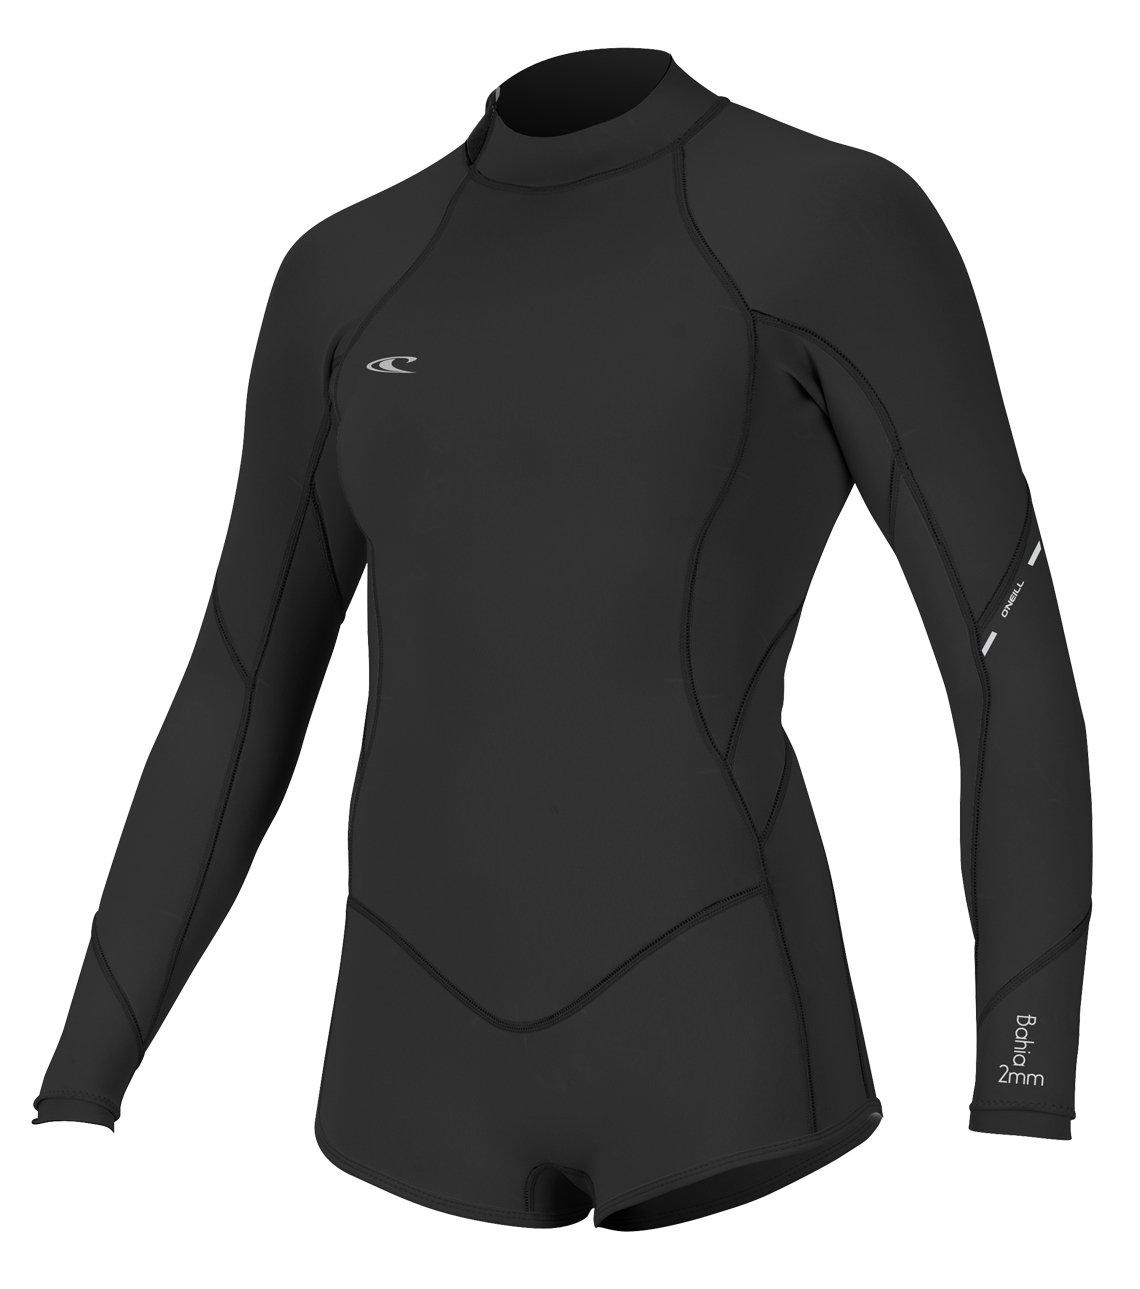 O'Neill Women's Bahia 2/1mm Back Zip Long Sleeve Short Spring Wetsuit, Black, 4